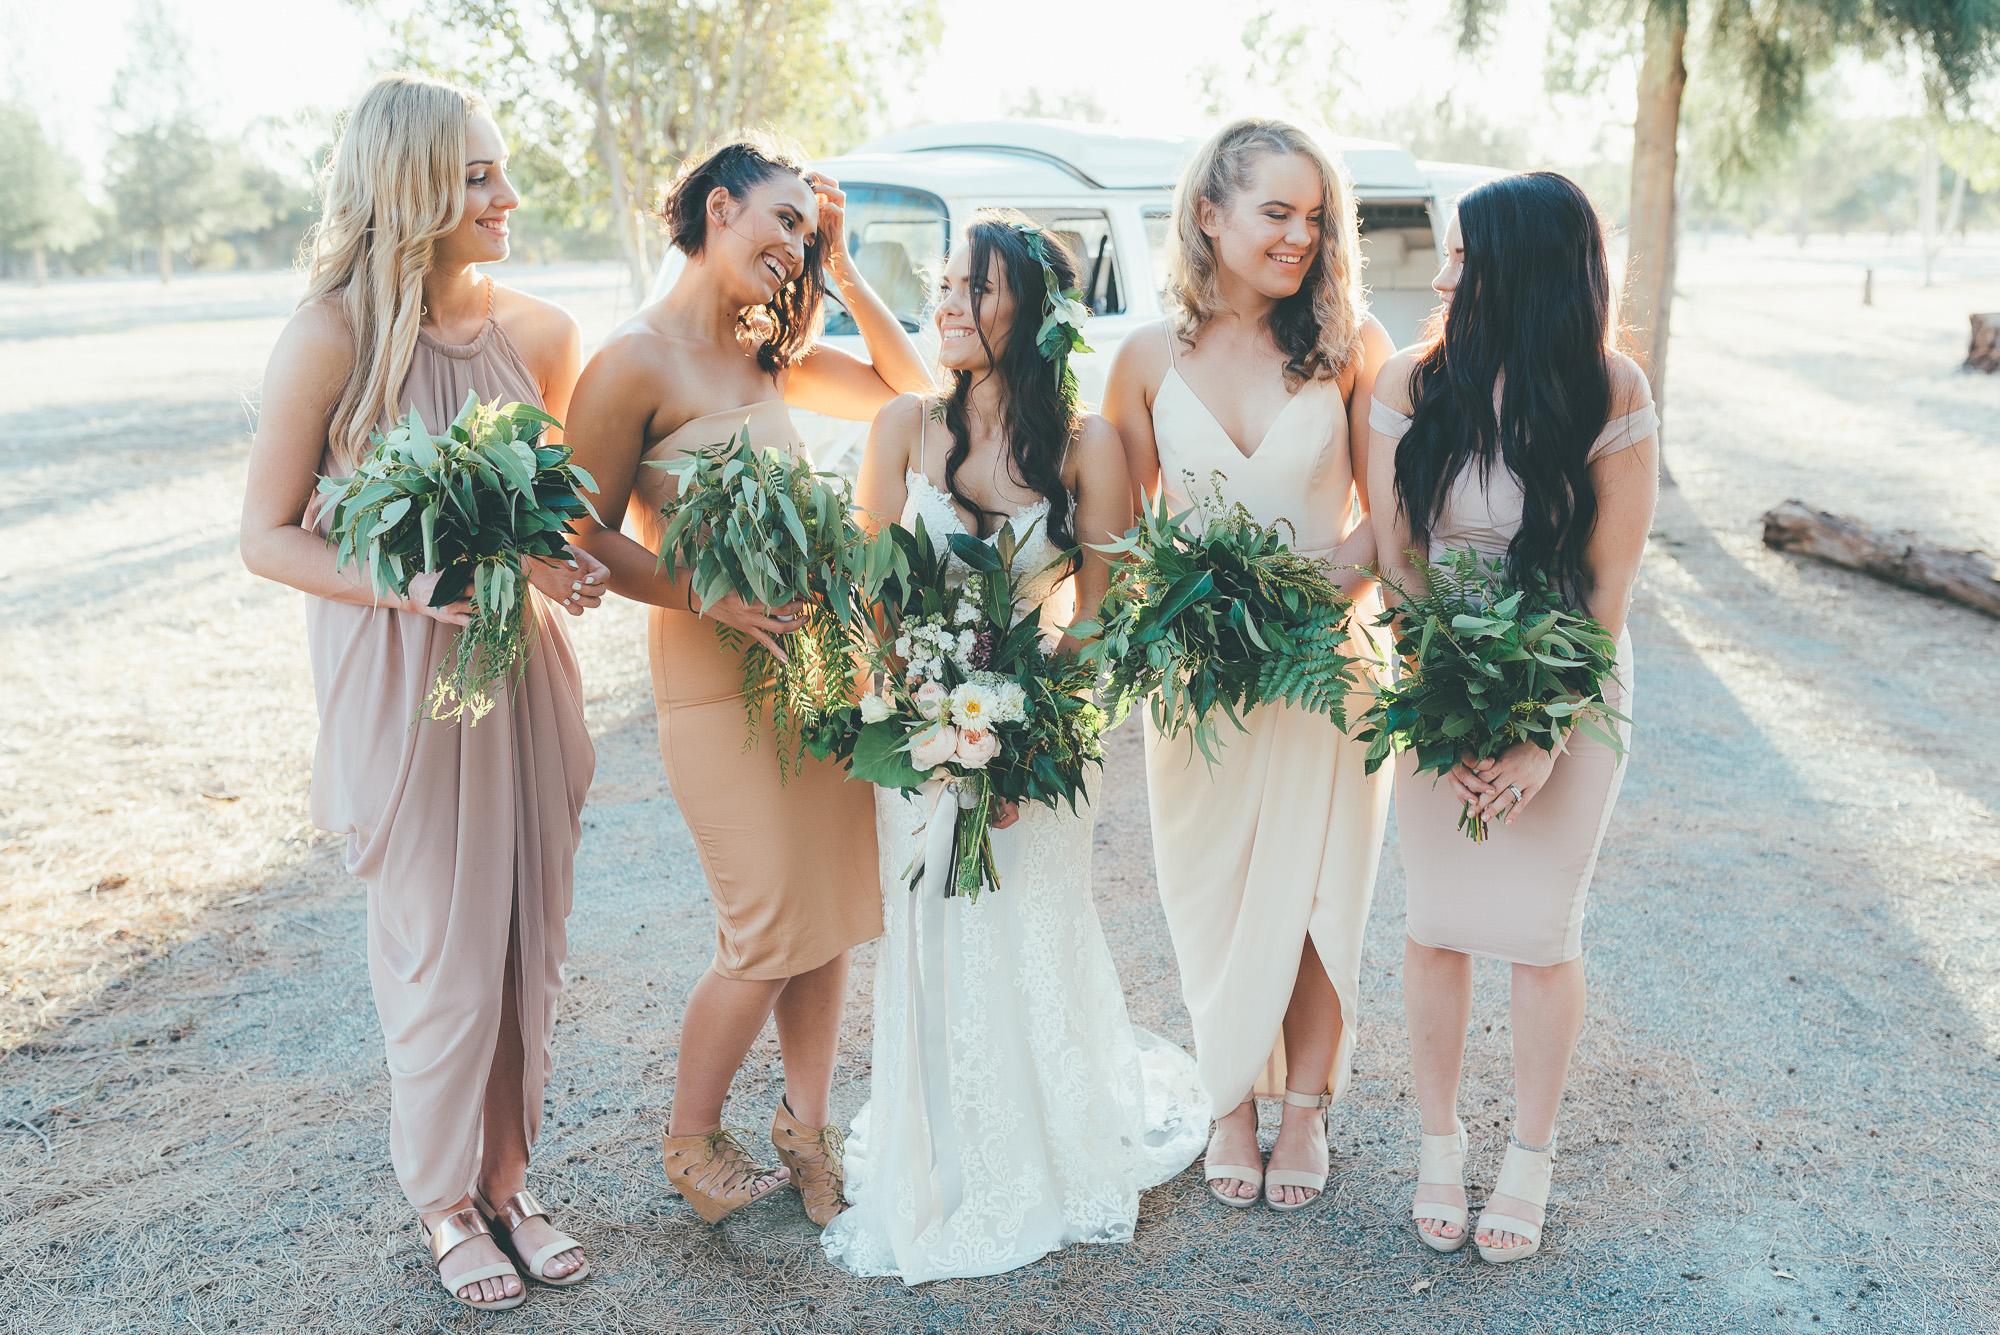 wedding-photographer-outdoor-casual-styled-los-angeles-australia-california-international-earthbound -57.jpg